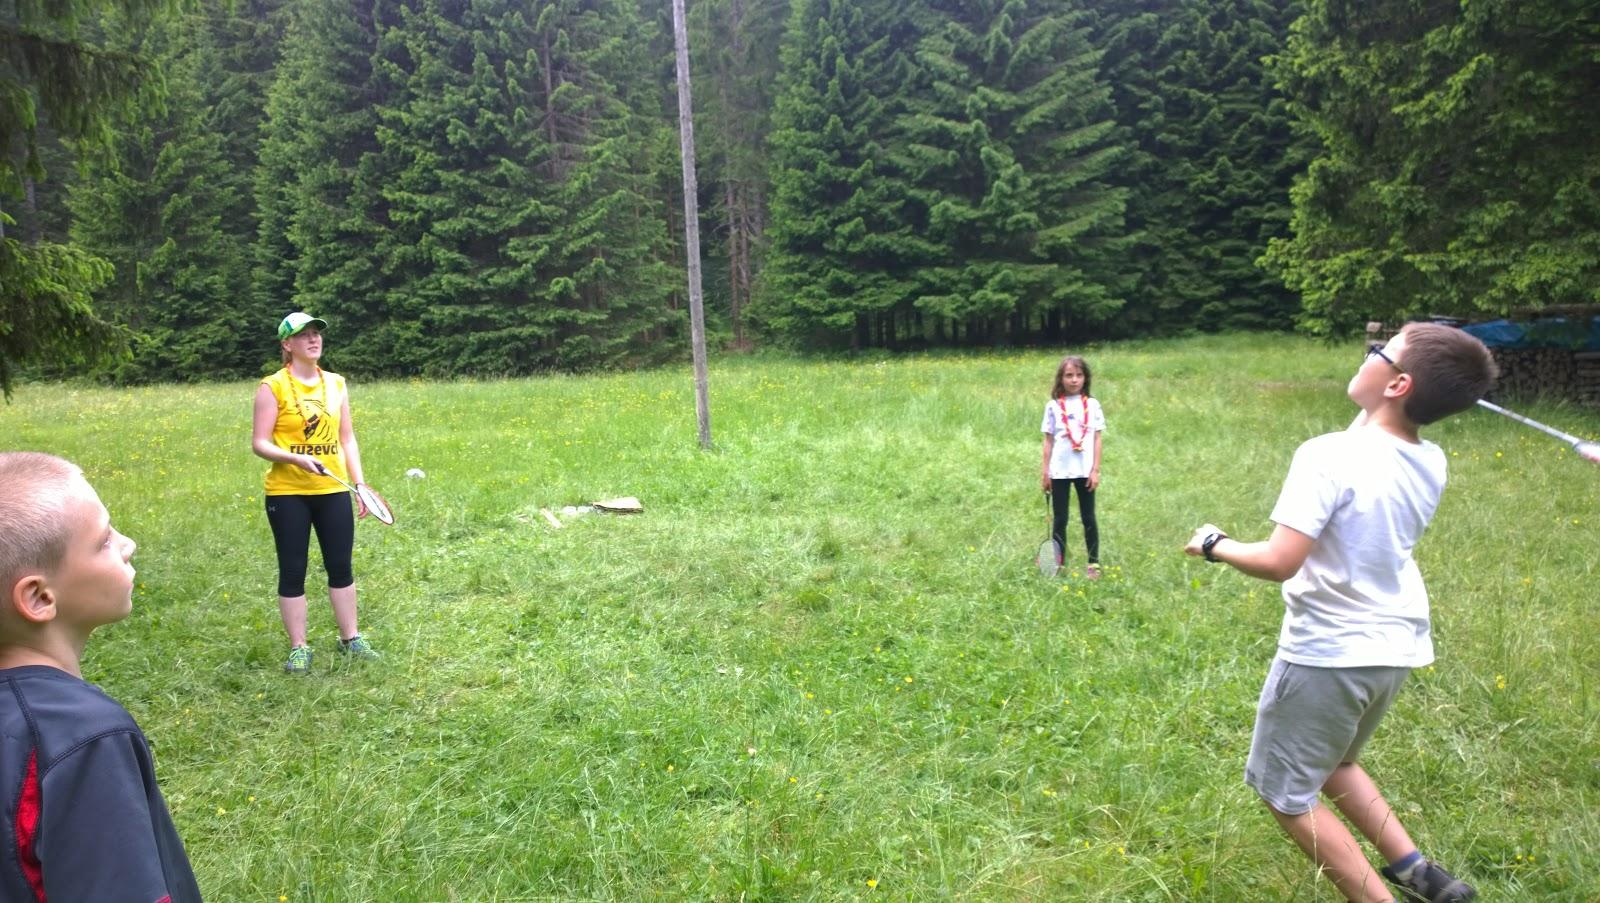 Piknik s starši, Črni dol 2016 - WP_20160625_13_42_41_Pro.jpg